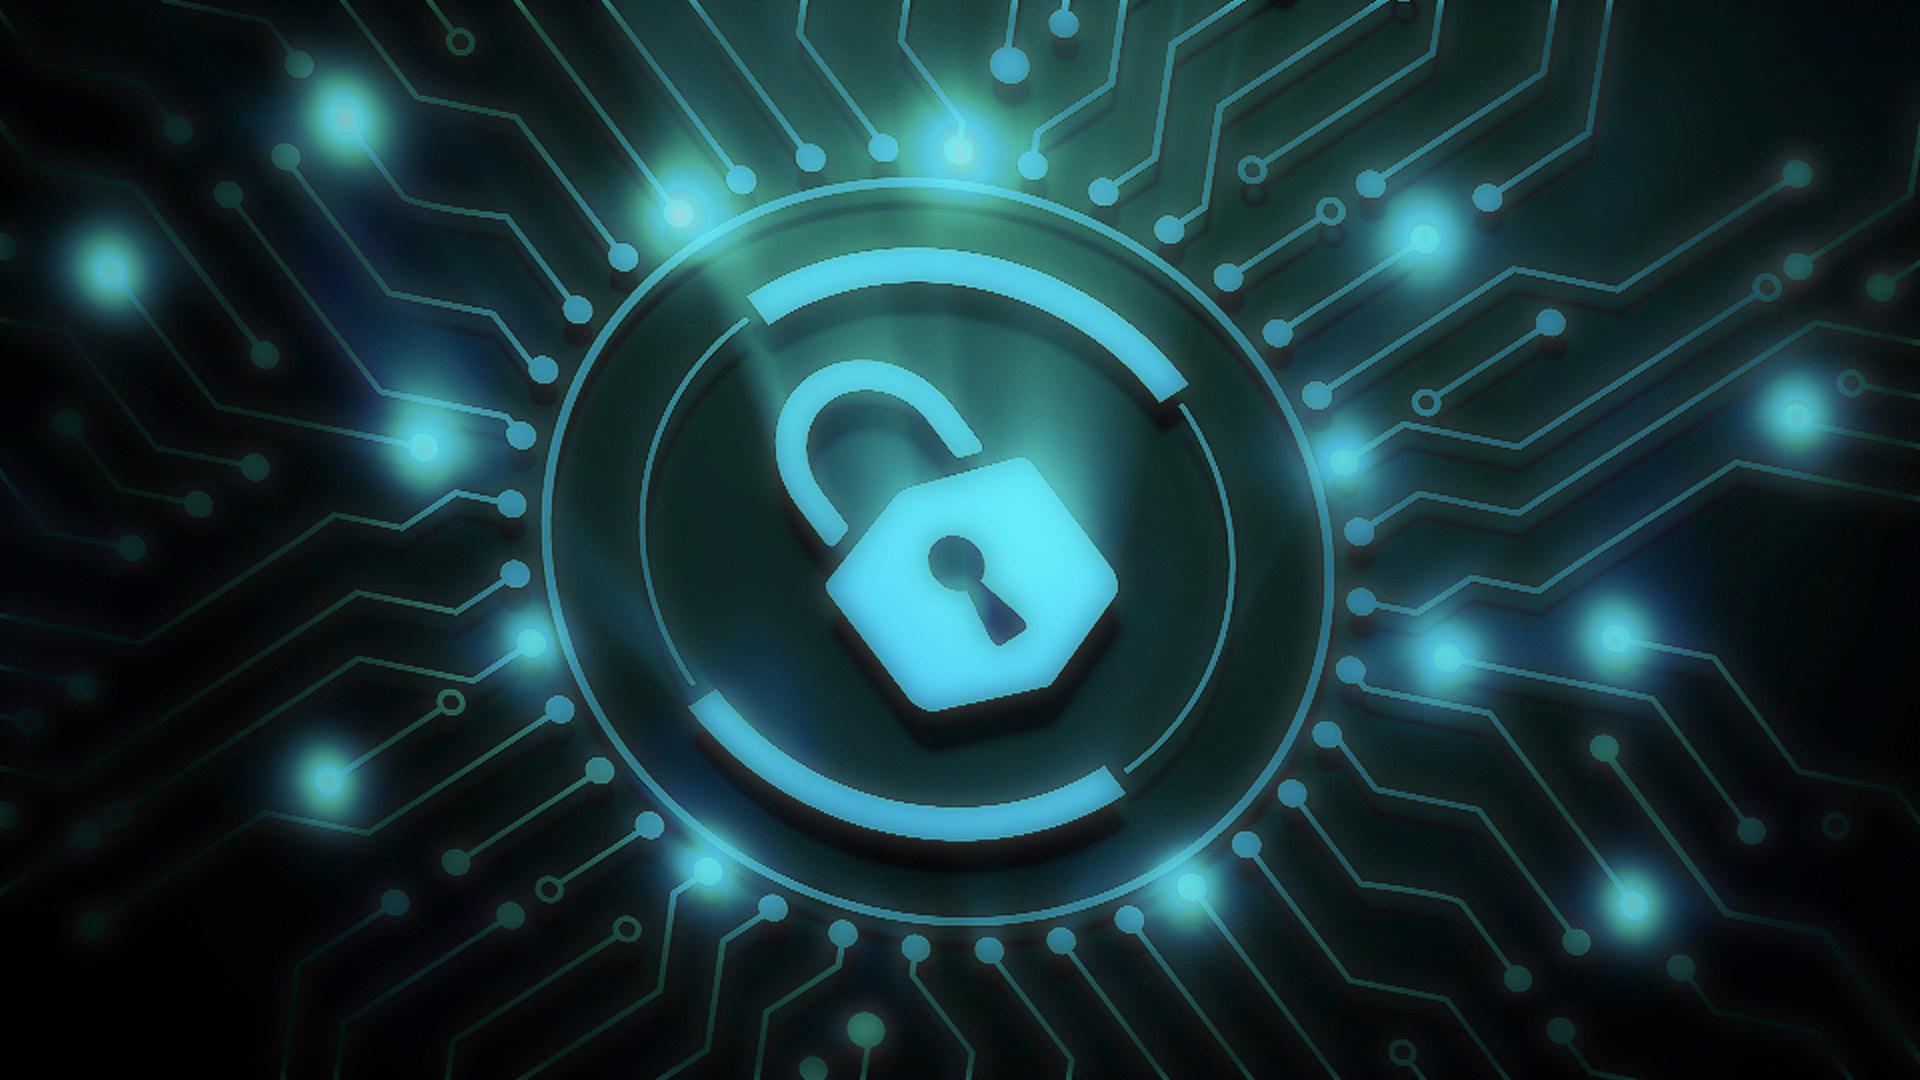 Sicherheit, Sicherheitslücke, Leak, Hacker, Security, Malware, Hack, Angriff, Bug, Virus, Trojaner, Kriminalität, Schadsoftware, Exploit, Cybercrime, Cybersecurity, Hacking, Ransomware, Spam, Hackerangriff, Erpressung, Internetkriminalität, Phishing, Ddos, Warnung, Darknet, Hacken, Hacker Angriffe, Hacker Angriff, Attack, Ransom, Hacks, Viren, Gehackt, Crime, Schädling, China Hacker, Adware, Russische Hacker, Security Report, Error, Malware Warnung, Security Bulletin, Promi-Hacker, Android Malware, Phisher, Secure, Breaking